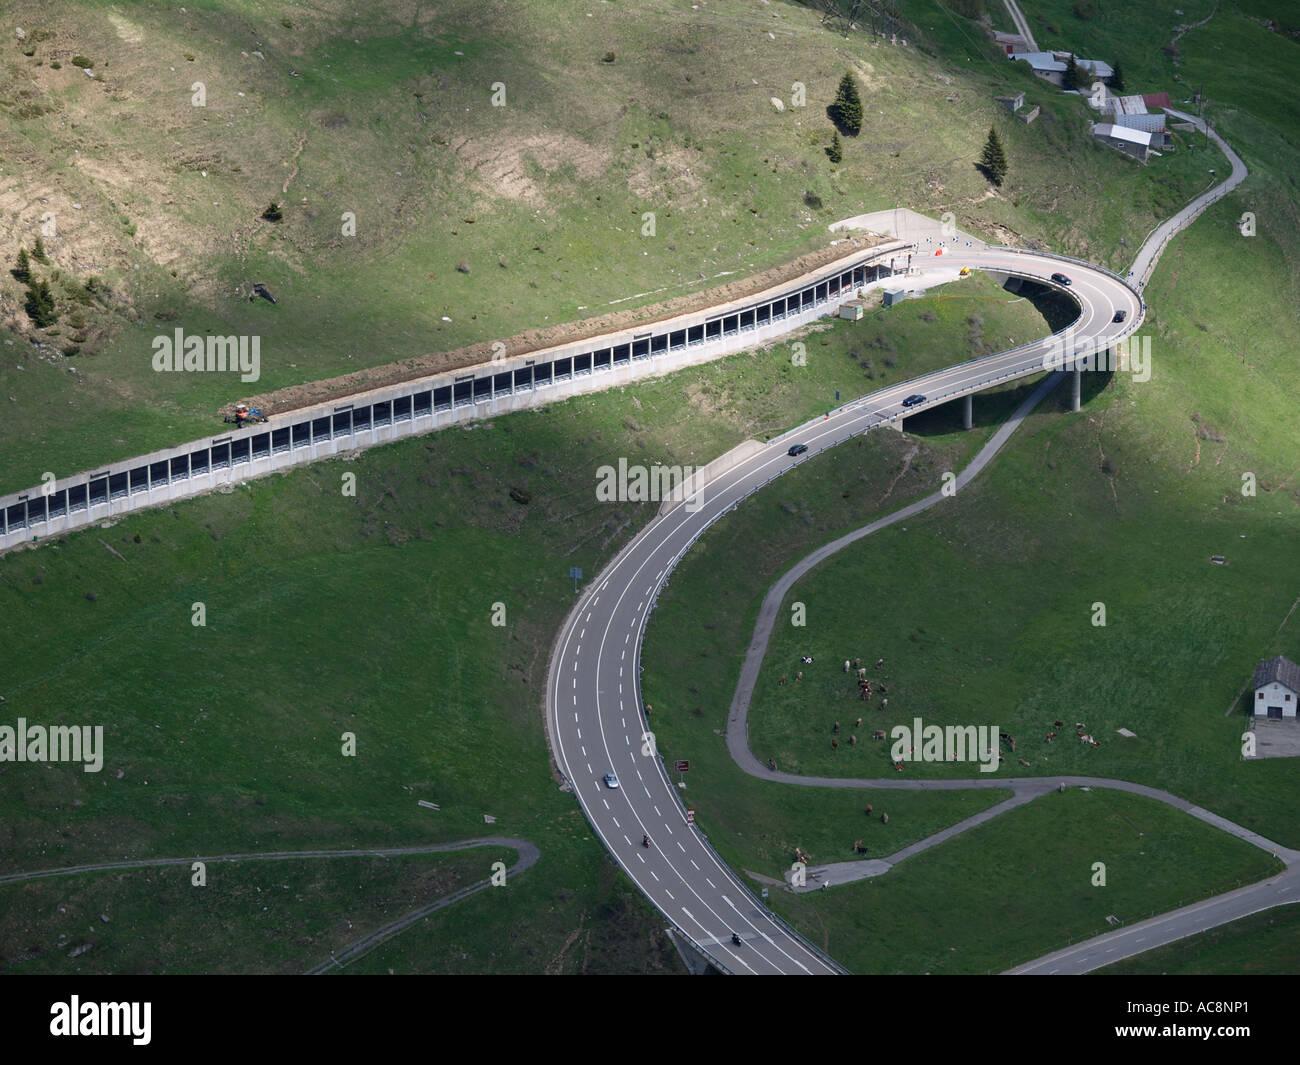 Saint Gotthard Tunnel Fotos e Imágenes de stock - Alamy